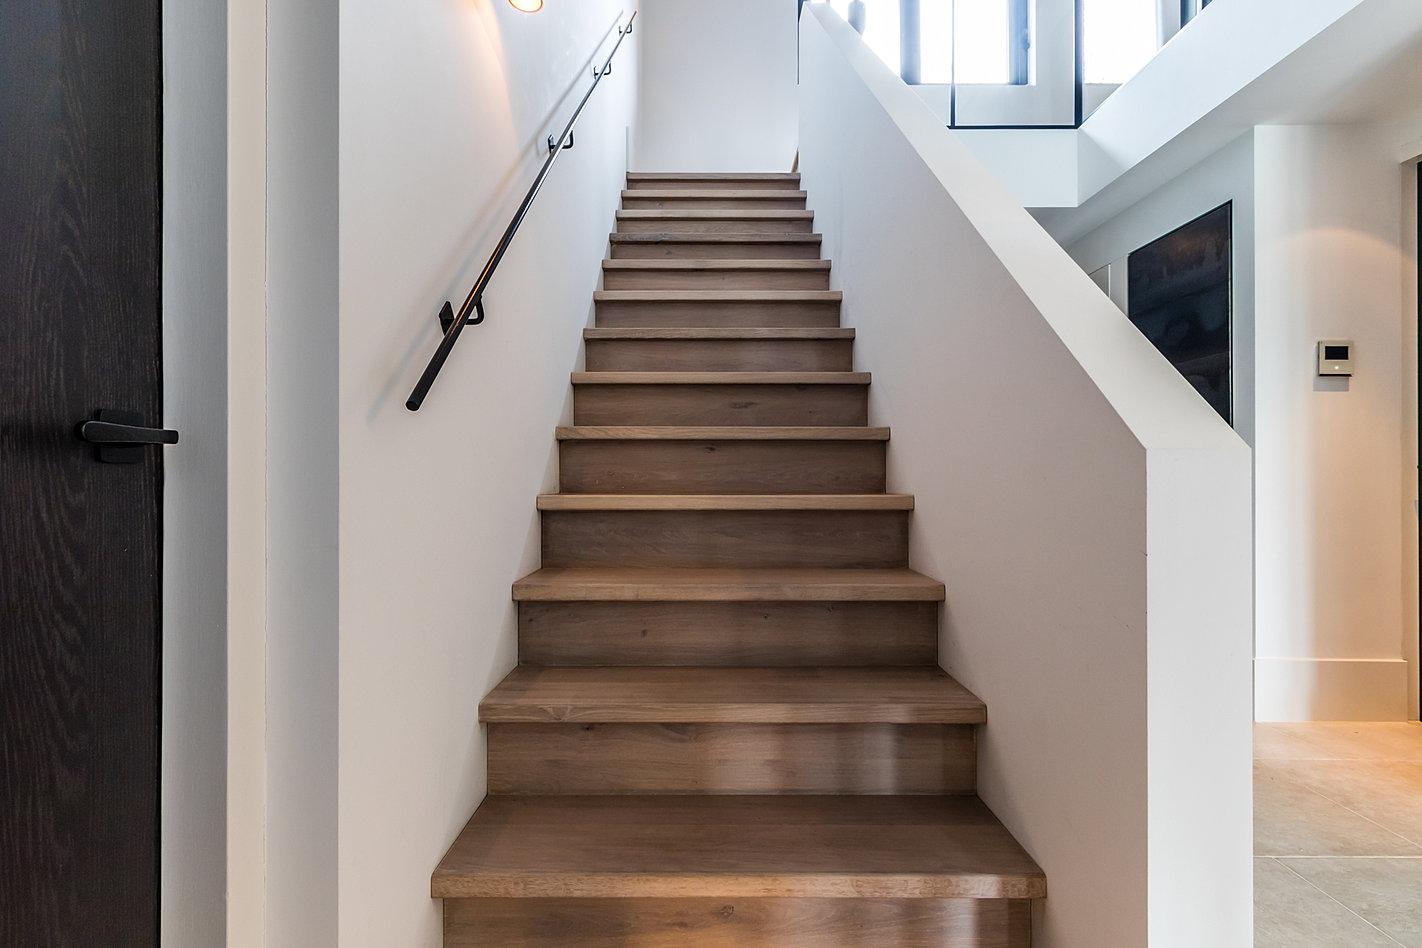 Van bruchem staircases moder trap met glazen balustrade for Balustrade trap